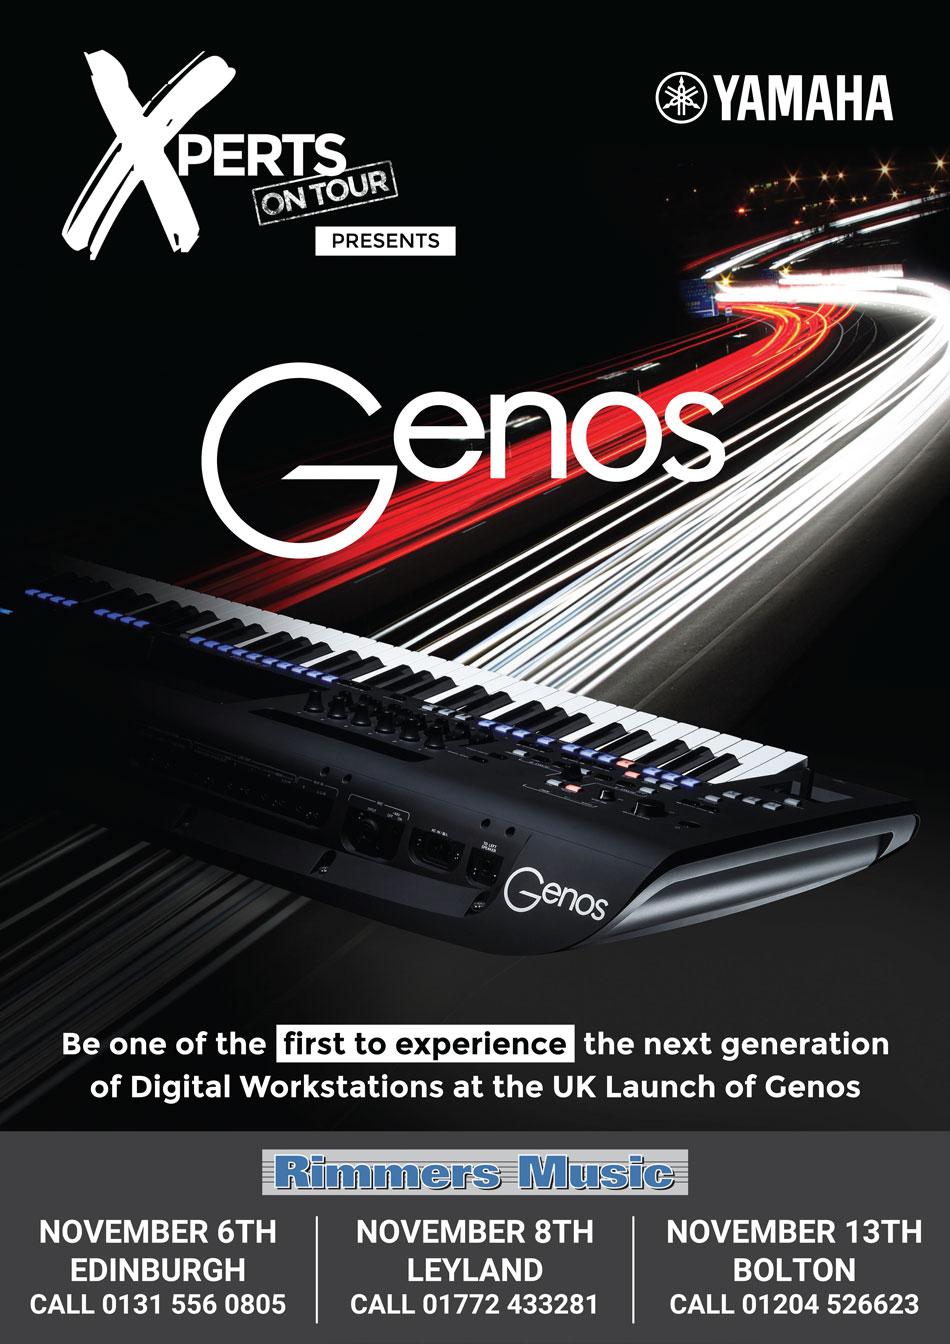 Yamaha Xperts On Toru Present Genos at Rimmers Music